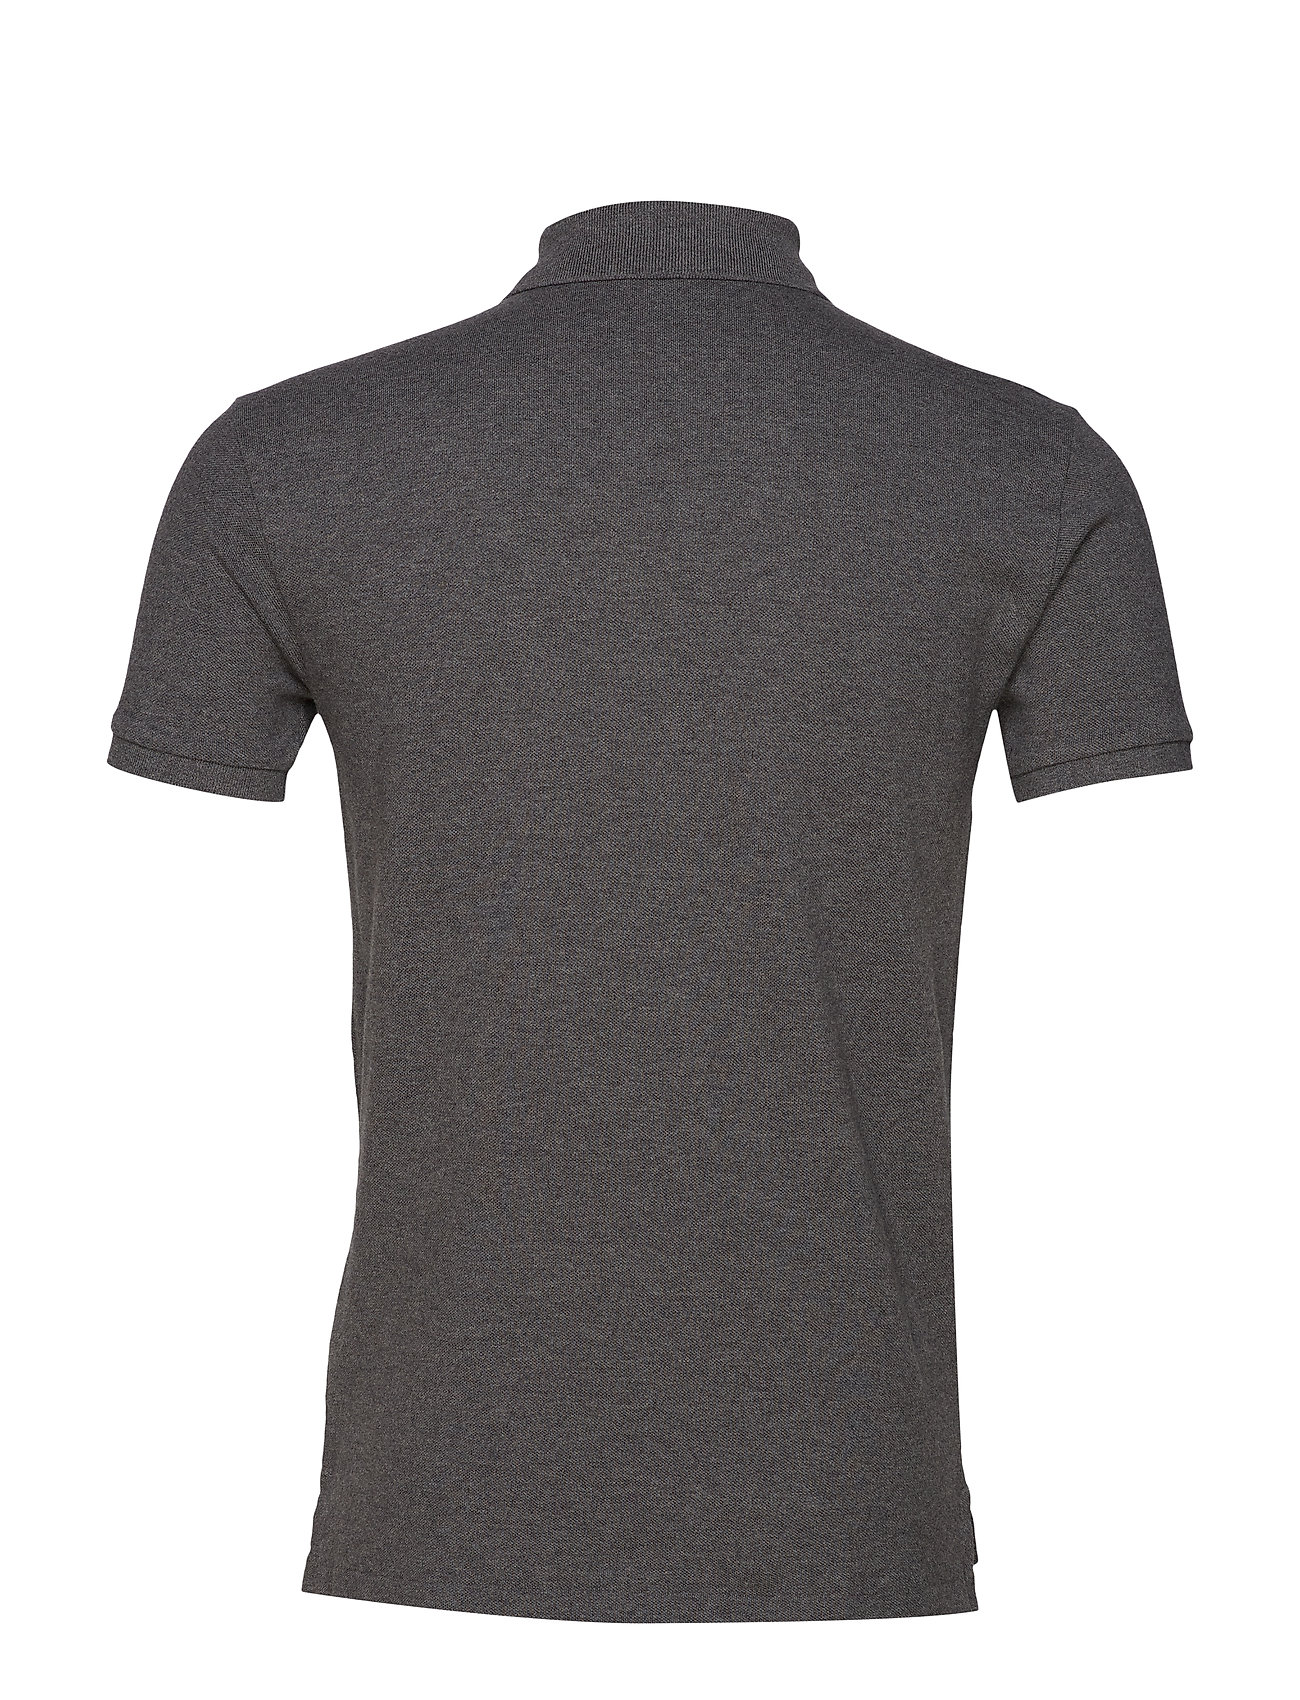 Flannel Slim Shirtmedium Lauren Fit Mesh Polo HeRalph WHE2eD9IY